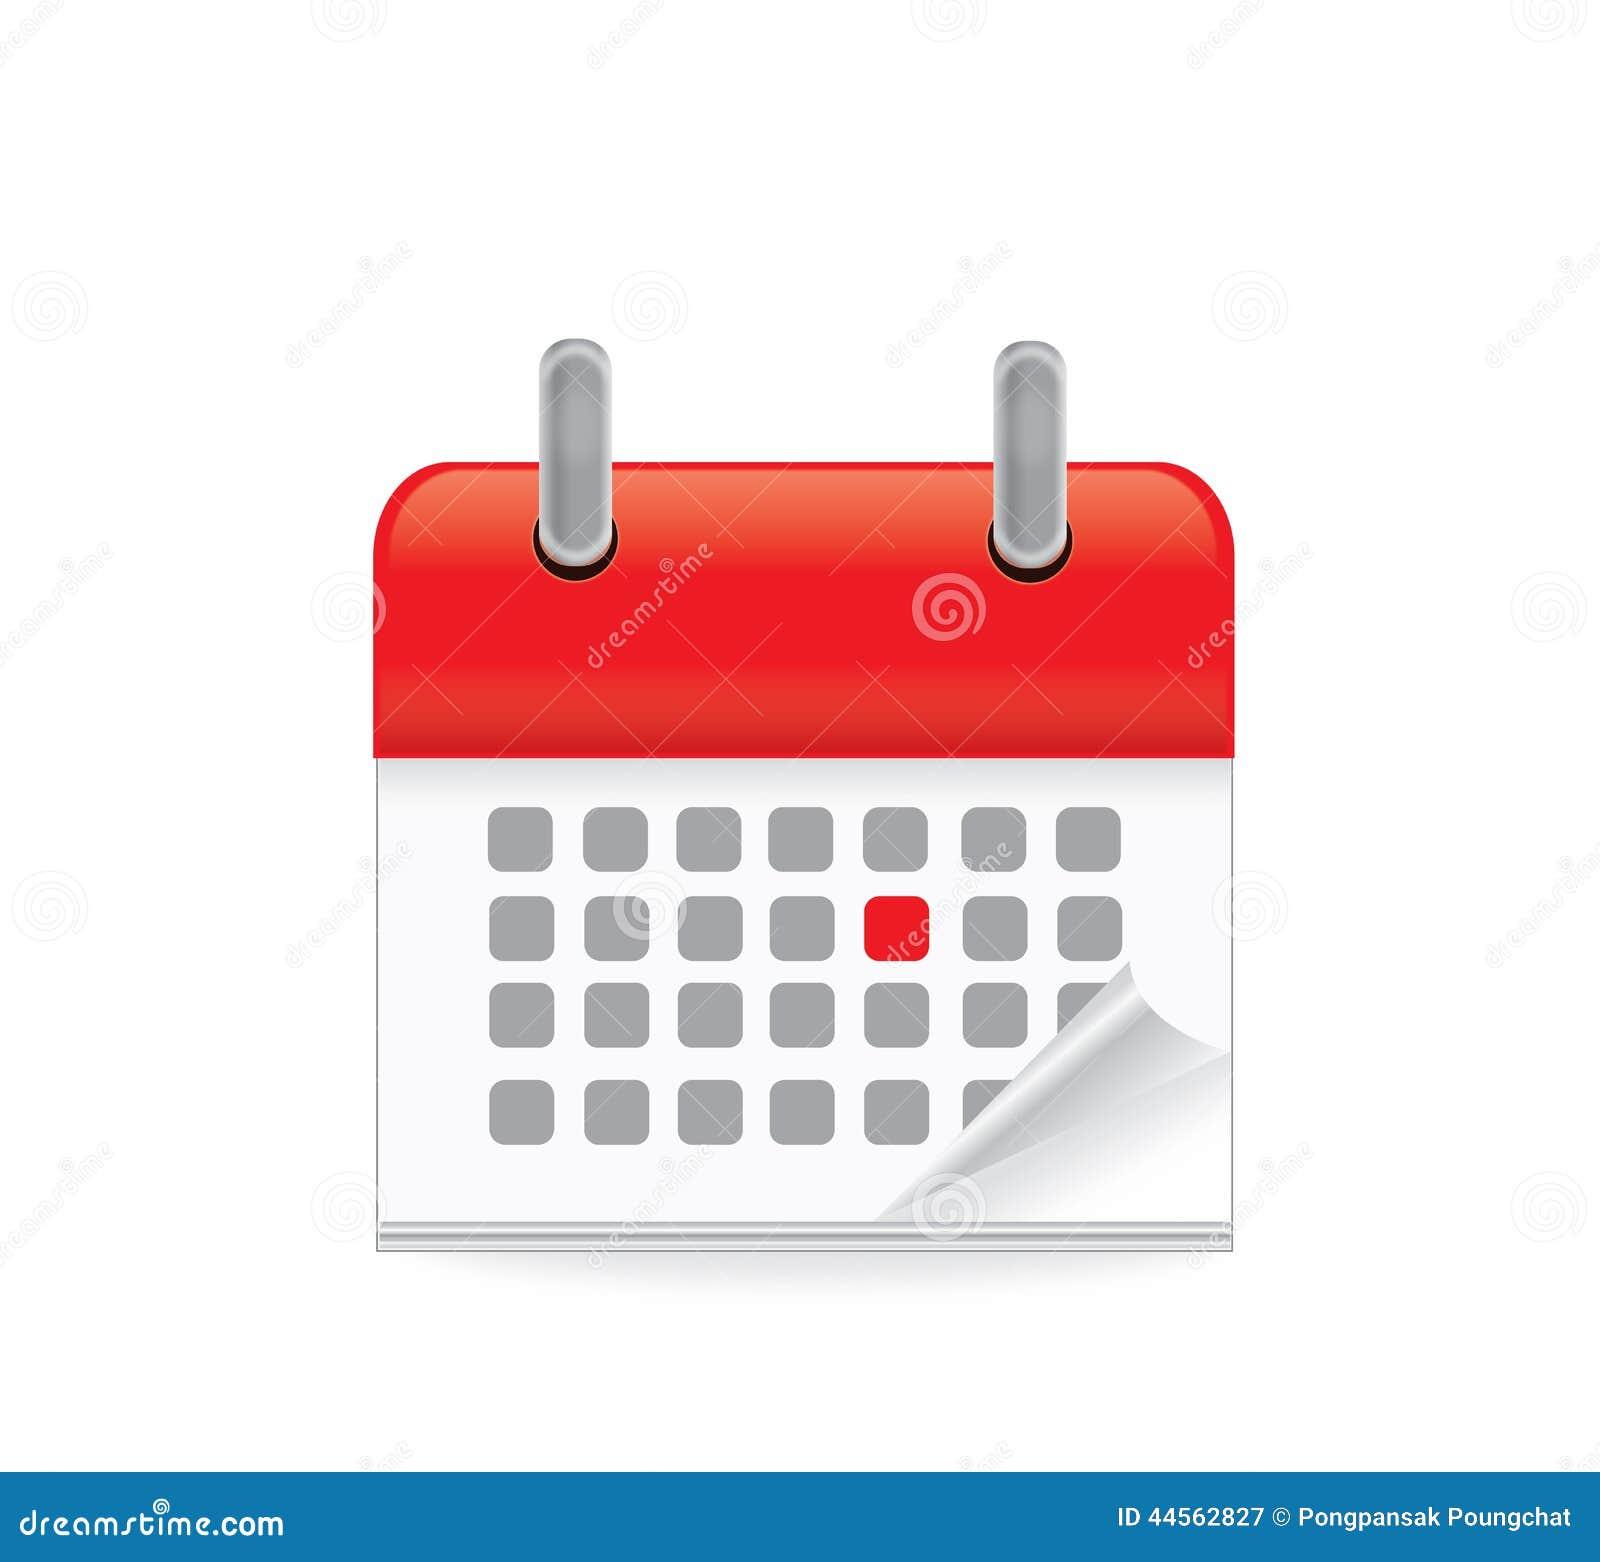 Calendar Day Vector Art : Calendar clock icon stock illustration of